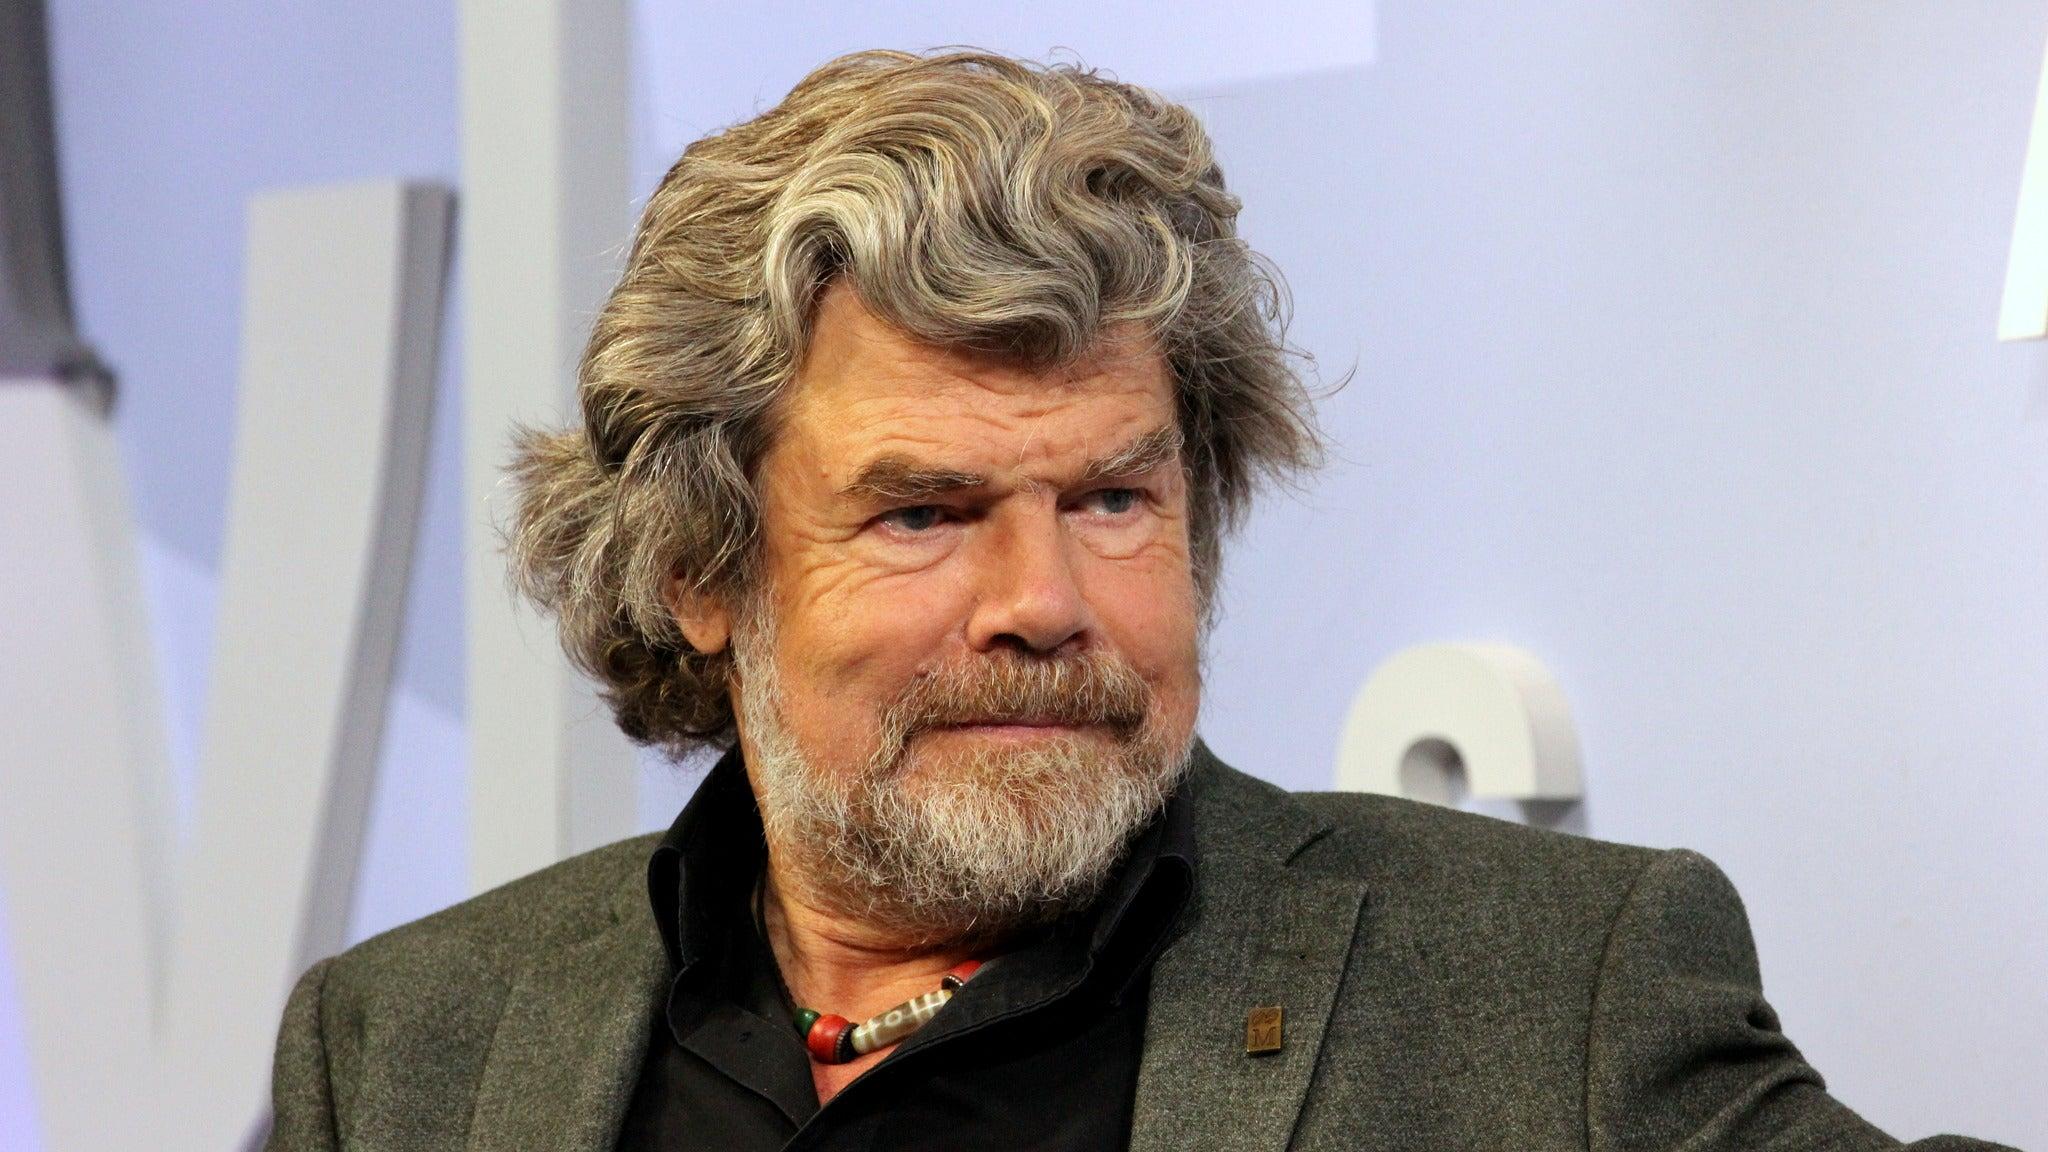 Reinhold Messner | Nanga Parbat - mein Schicksalsberg